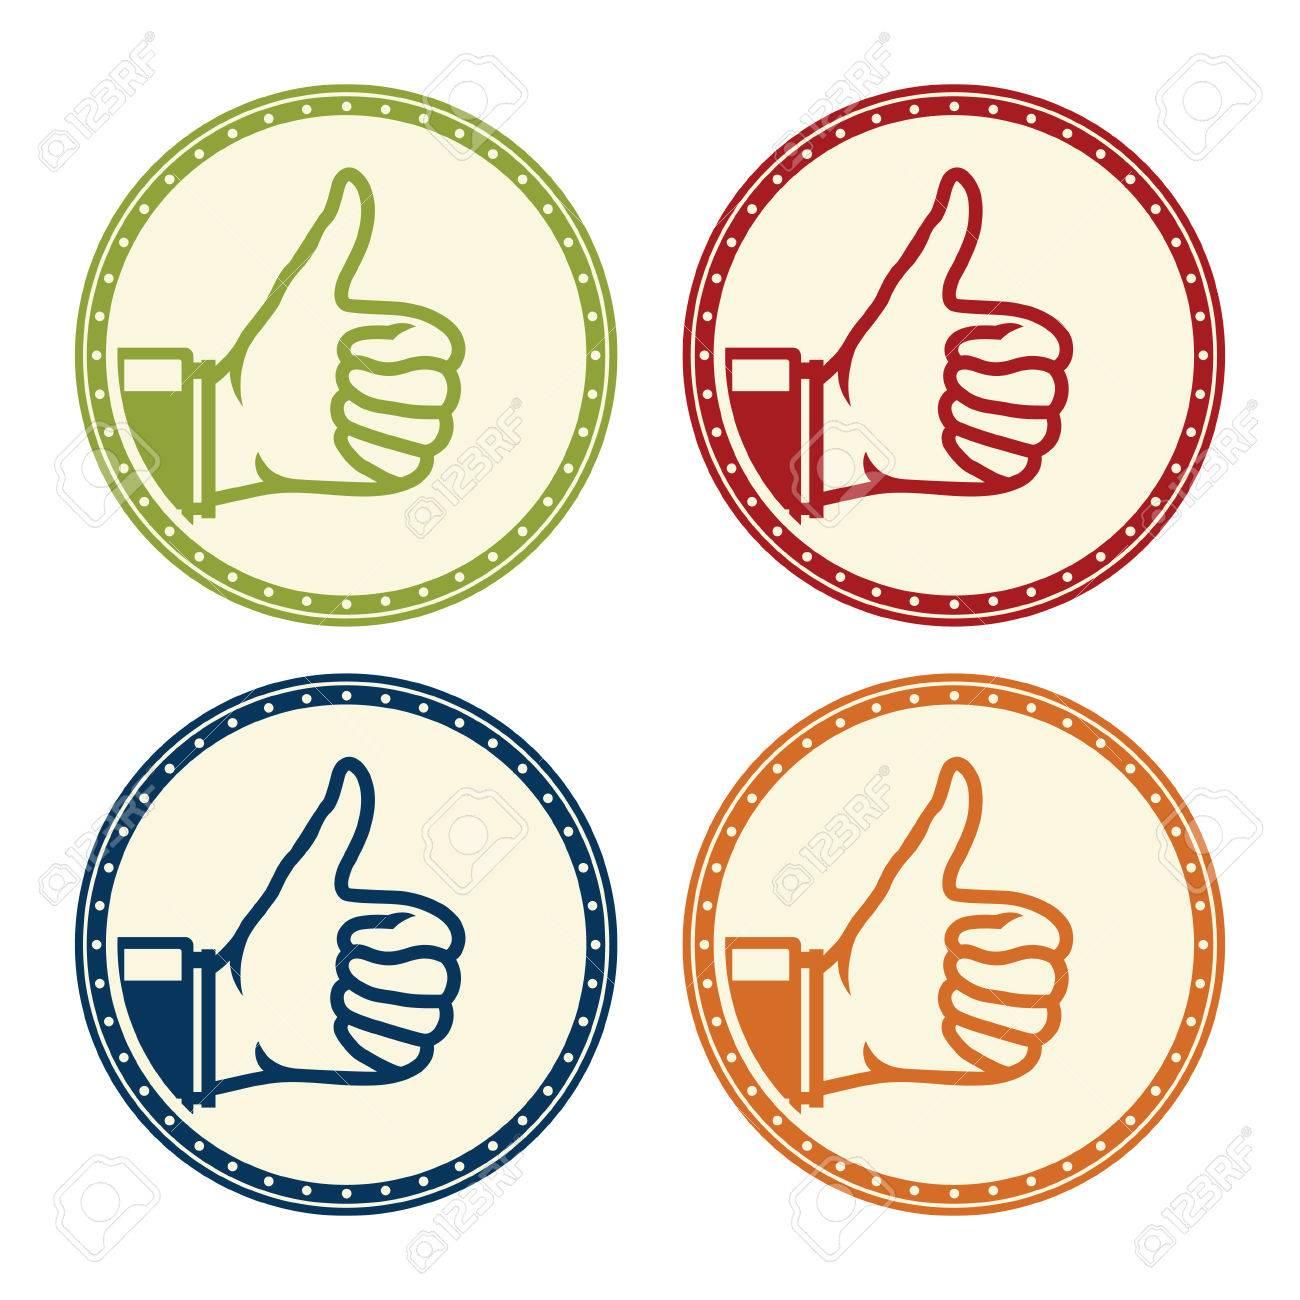 ok thumbs up icon - 38127918